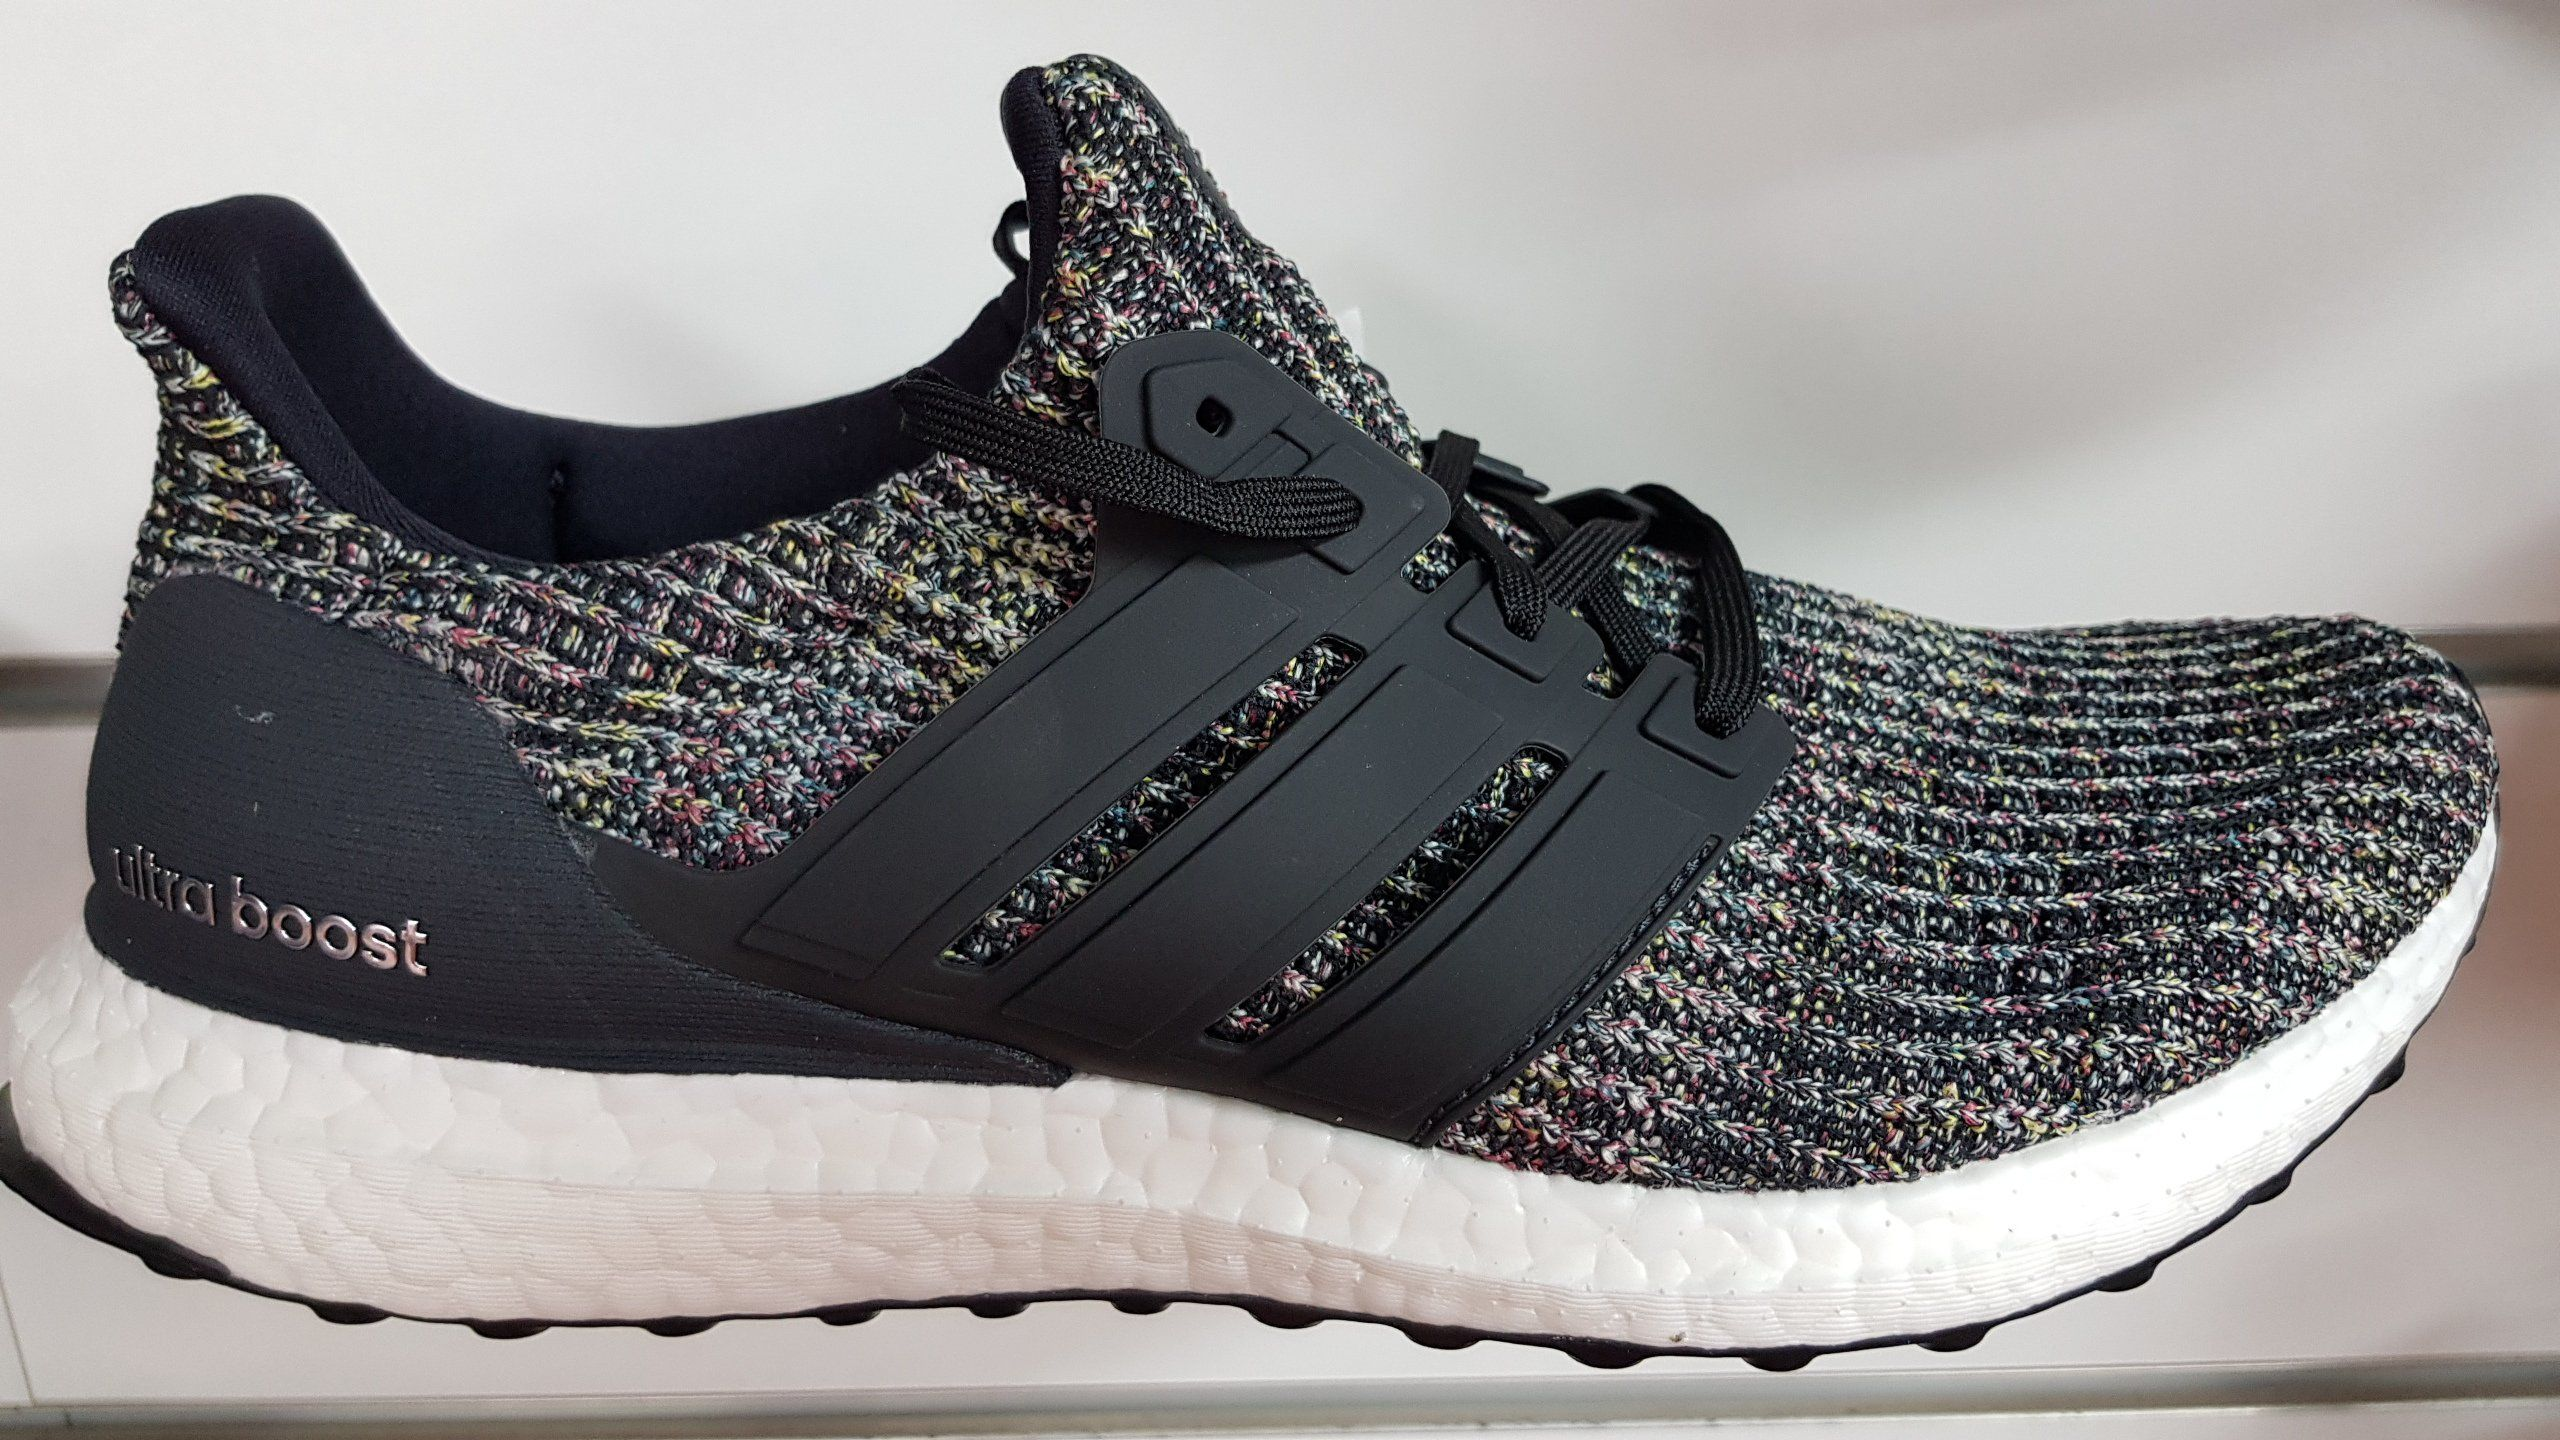 62b56169d נעל ריצה חדשה מבית אדידס CM8110 לגברים  אדידס  Ultraboost  Adidas  ארוספורט   Arosport  נעלי ספורט  ריצה  מבצעים  נעליים  נעלי ריצה